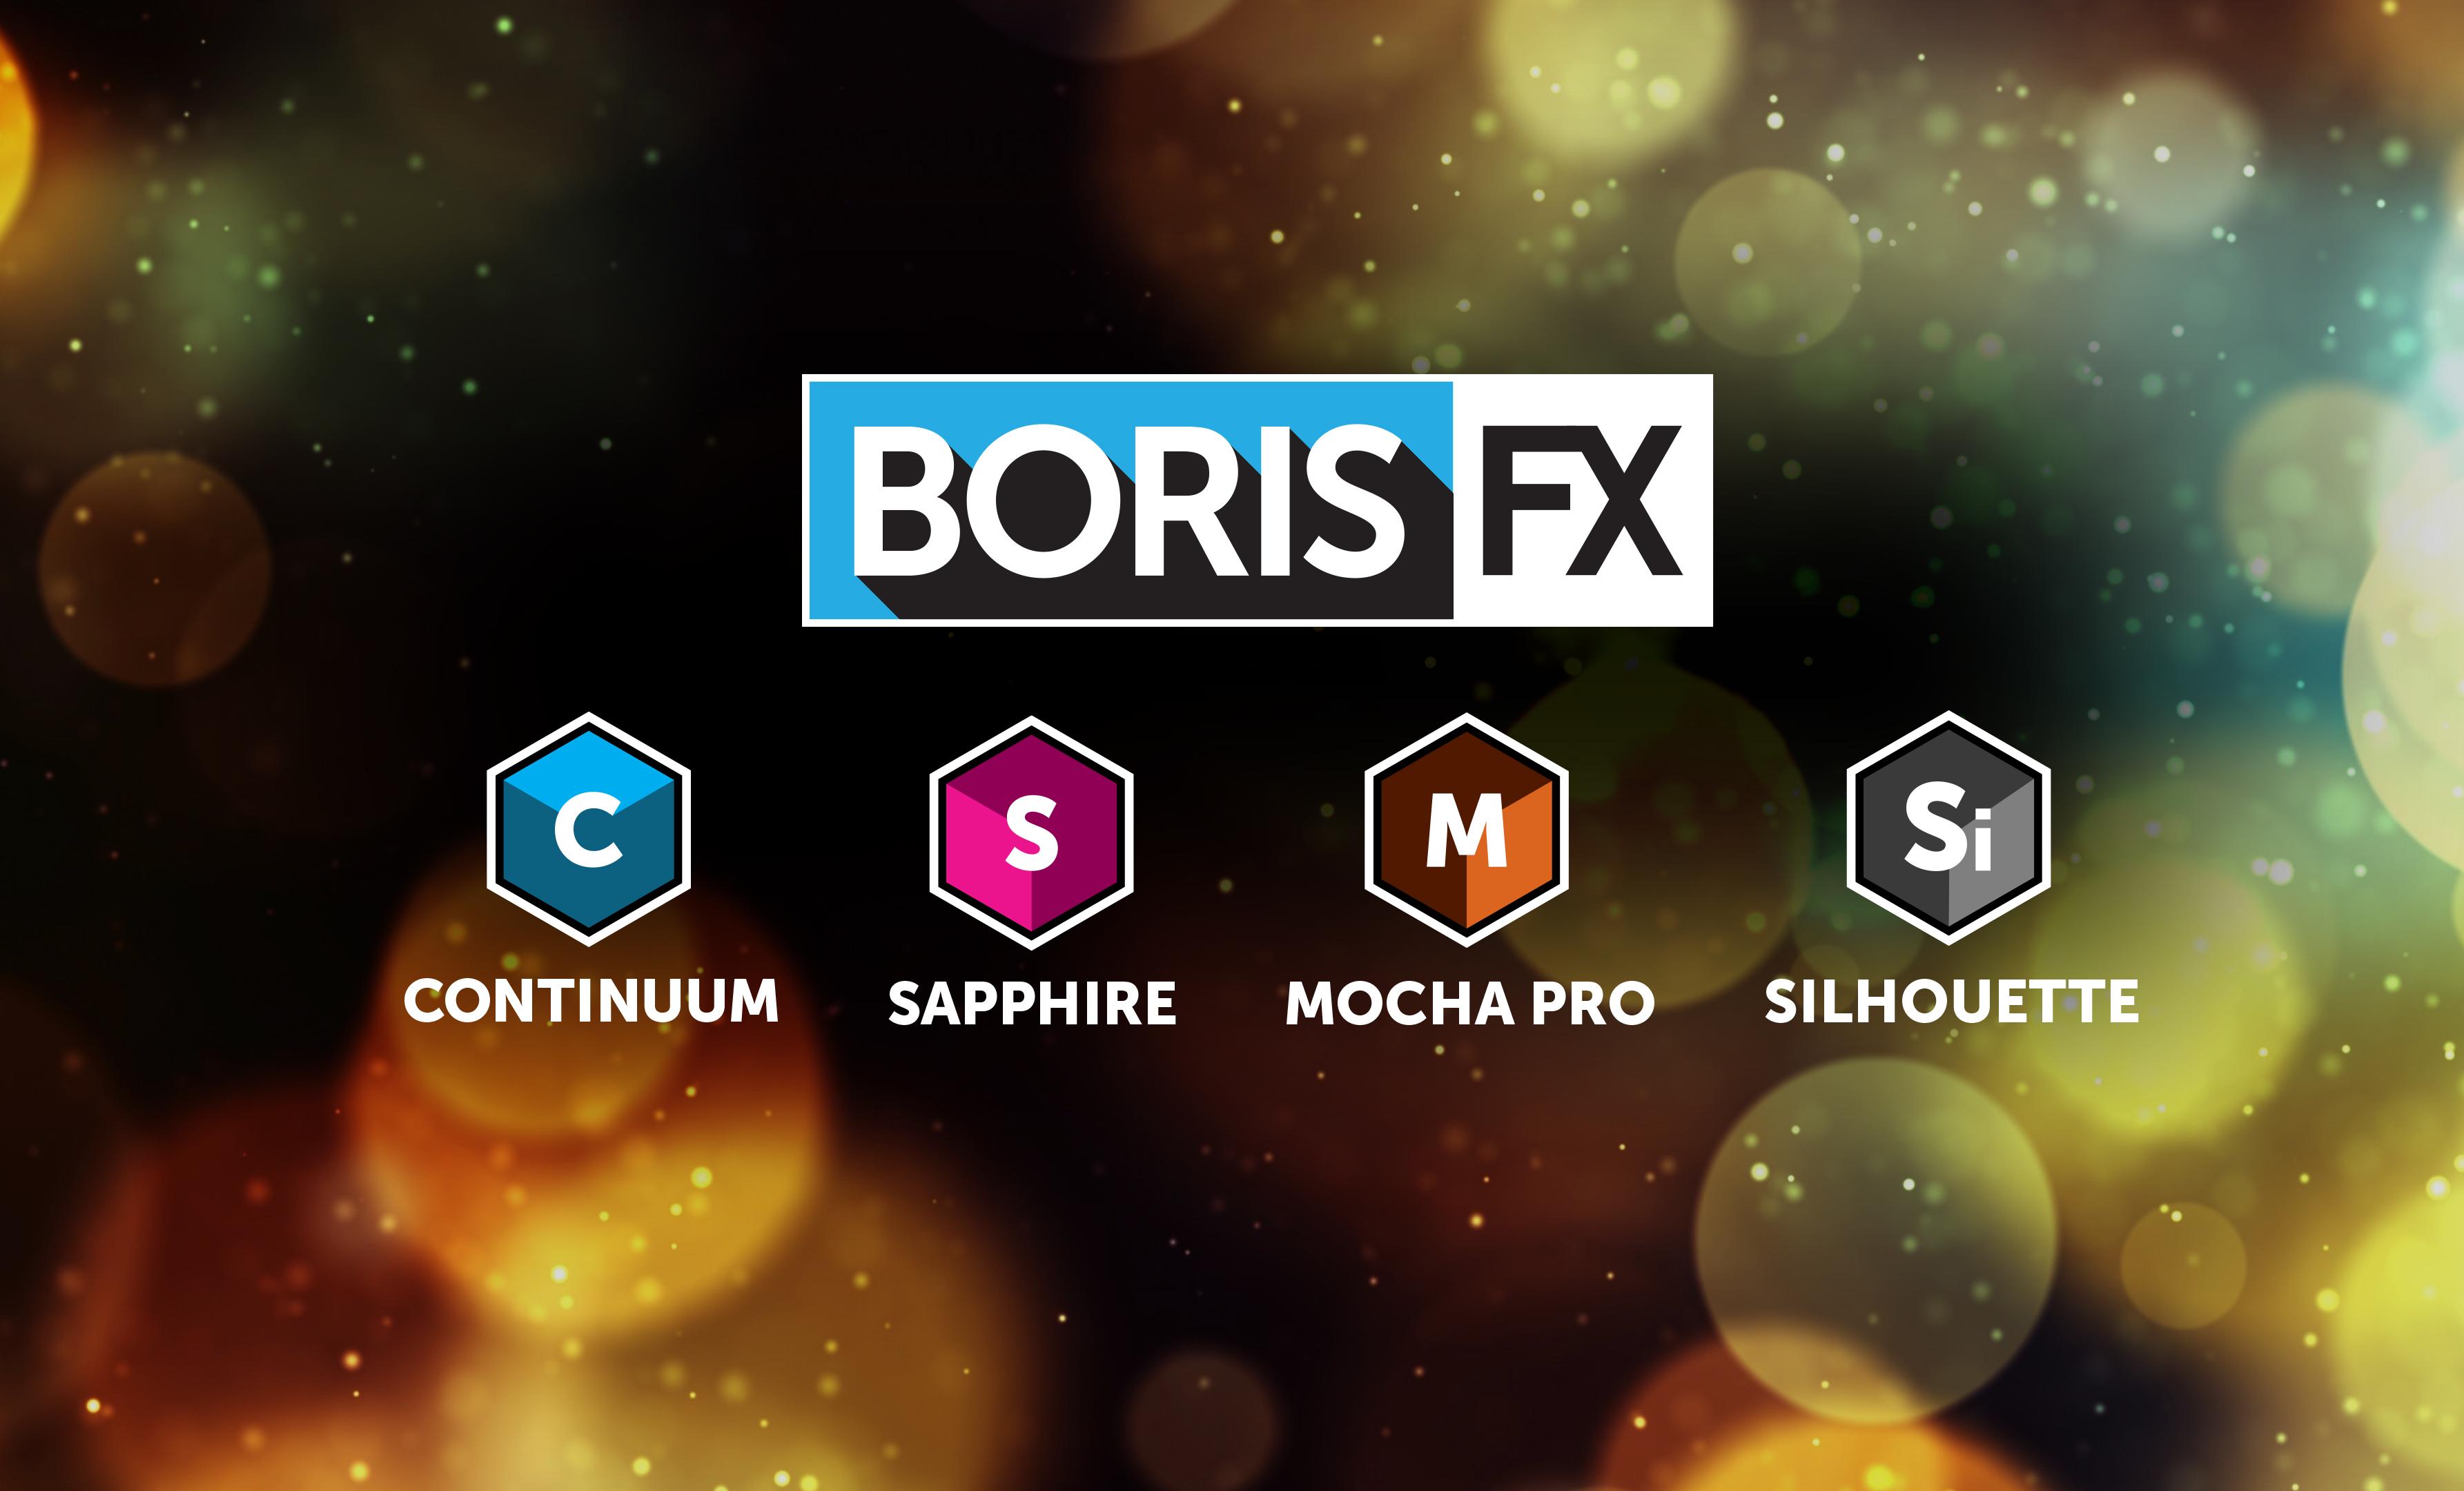 banner image featuring Boris FX Continuum, Sapphire, Mocha Pro, Silhouette